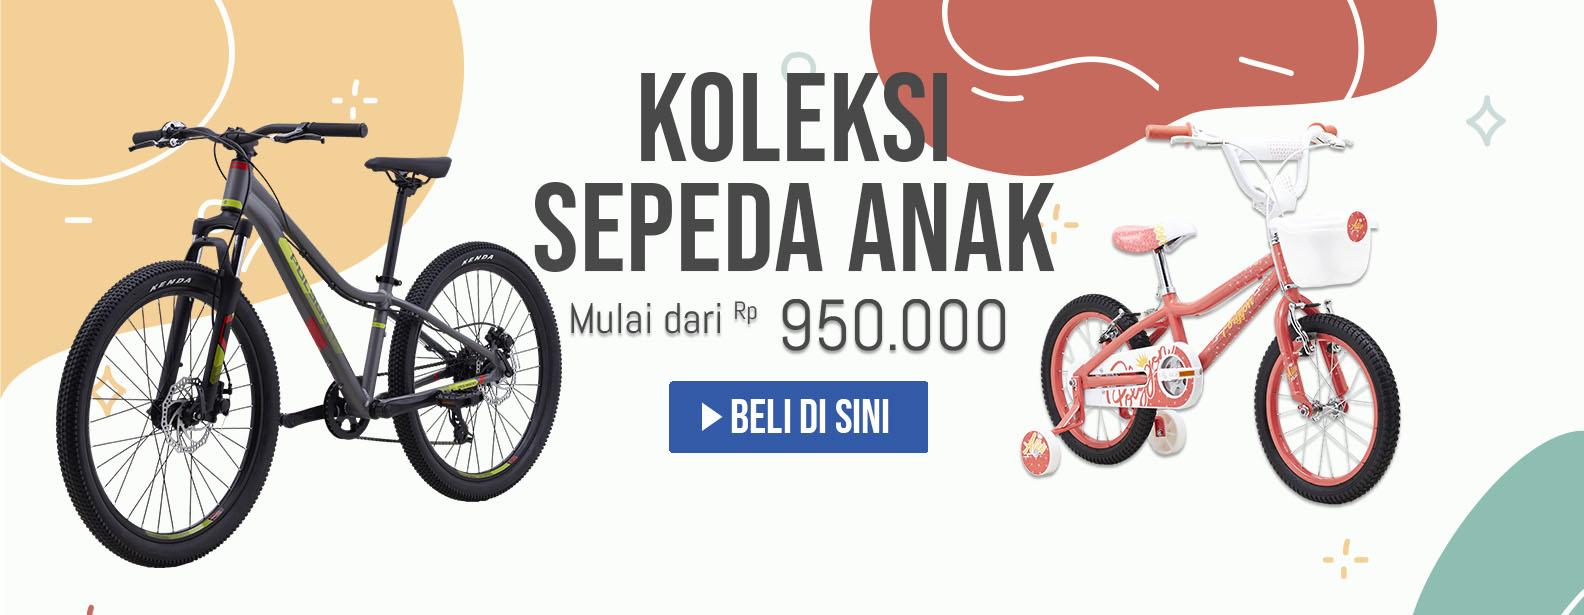 Beli Koleksi Sepeda Anak